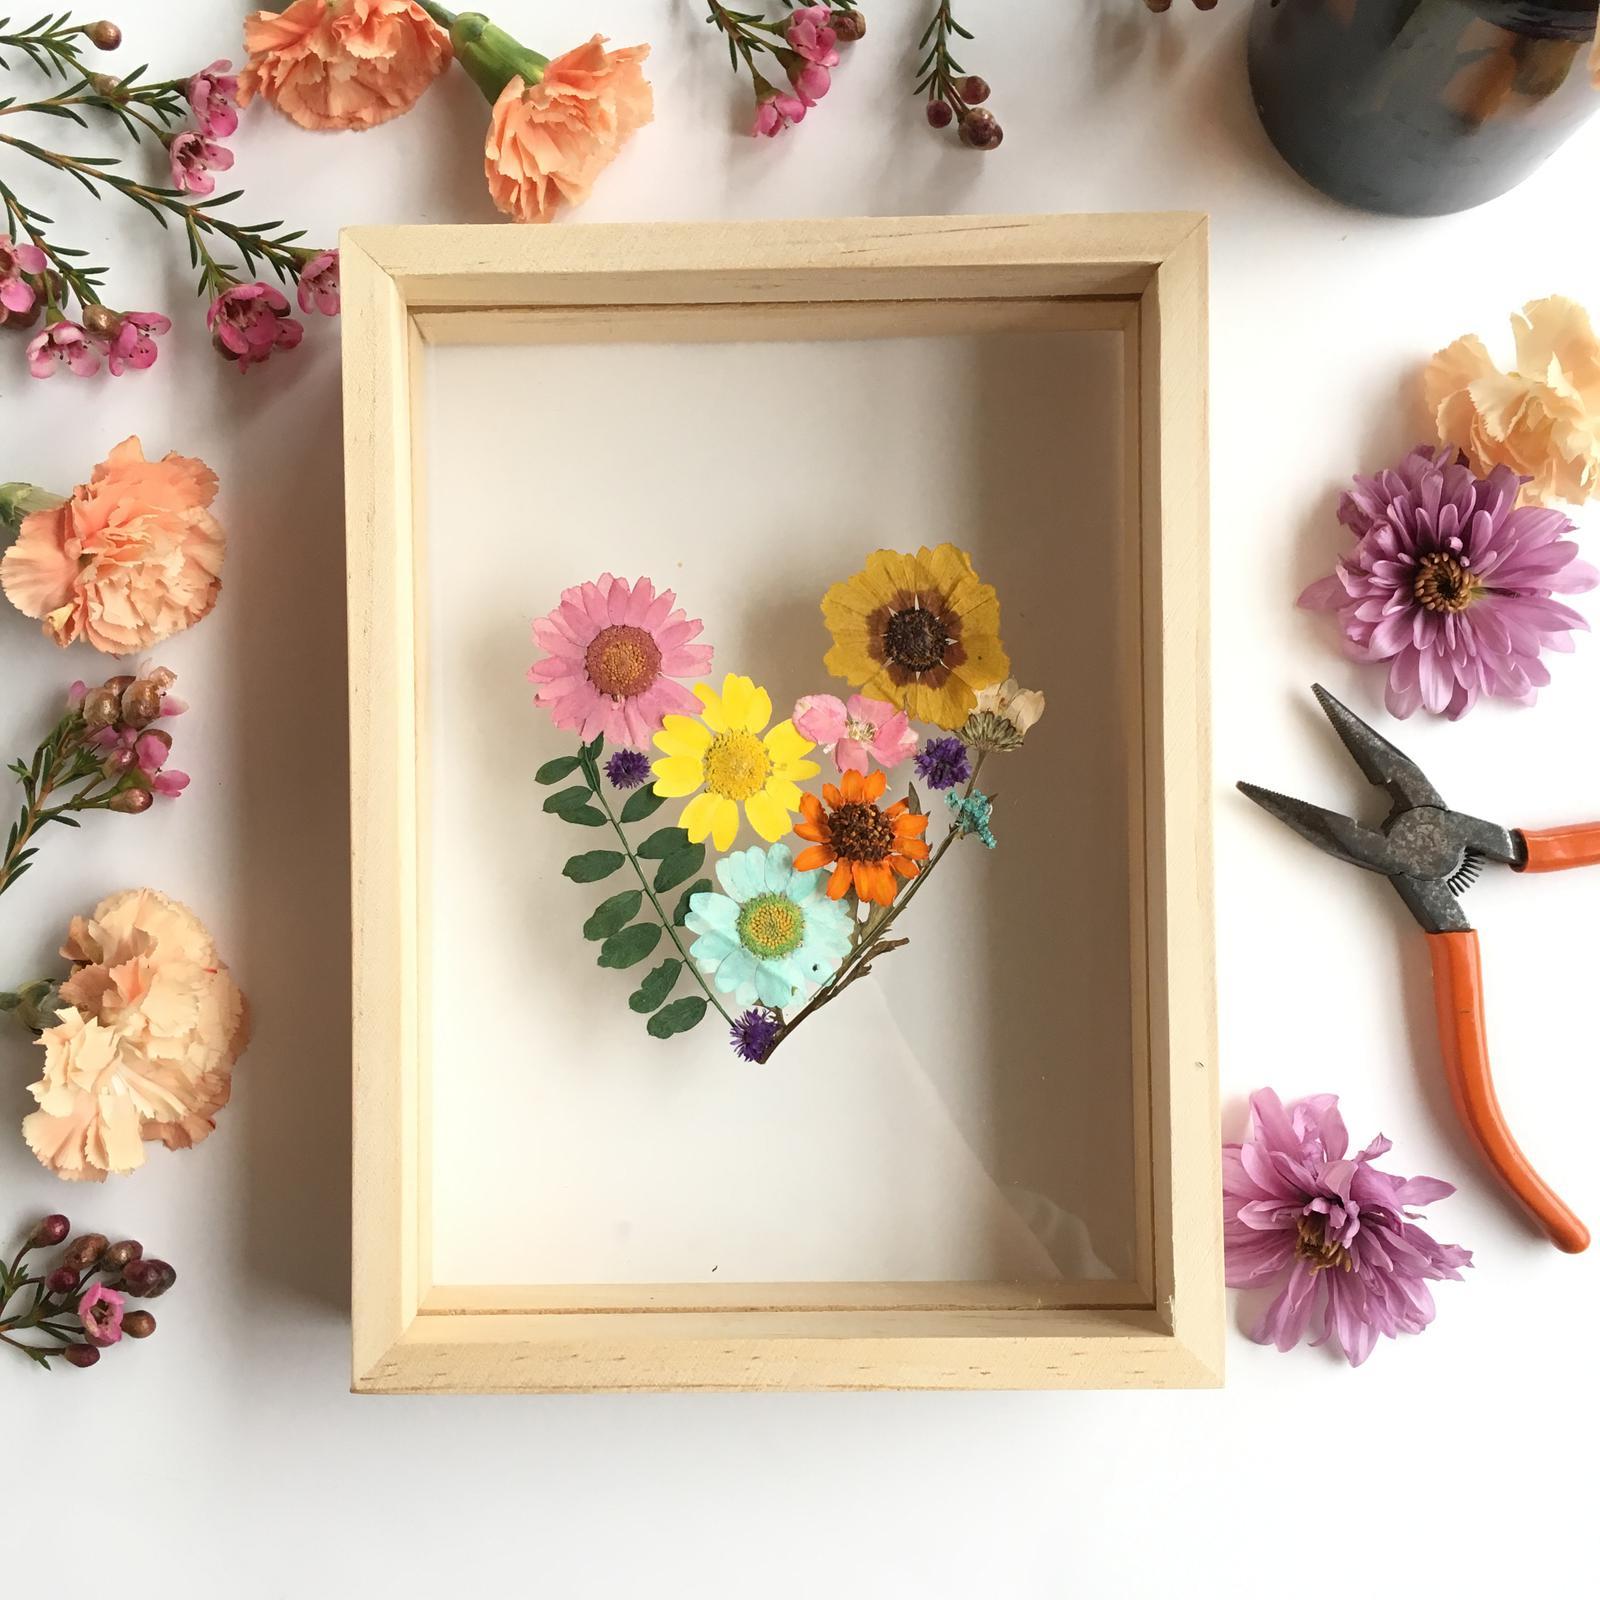 Heart Shaped Floral Frame